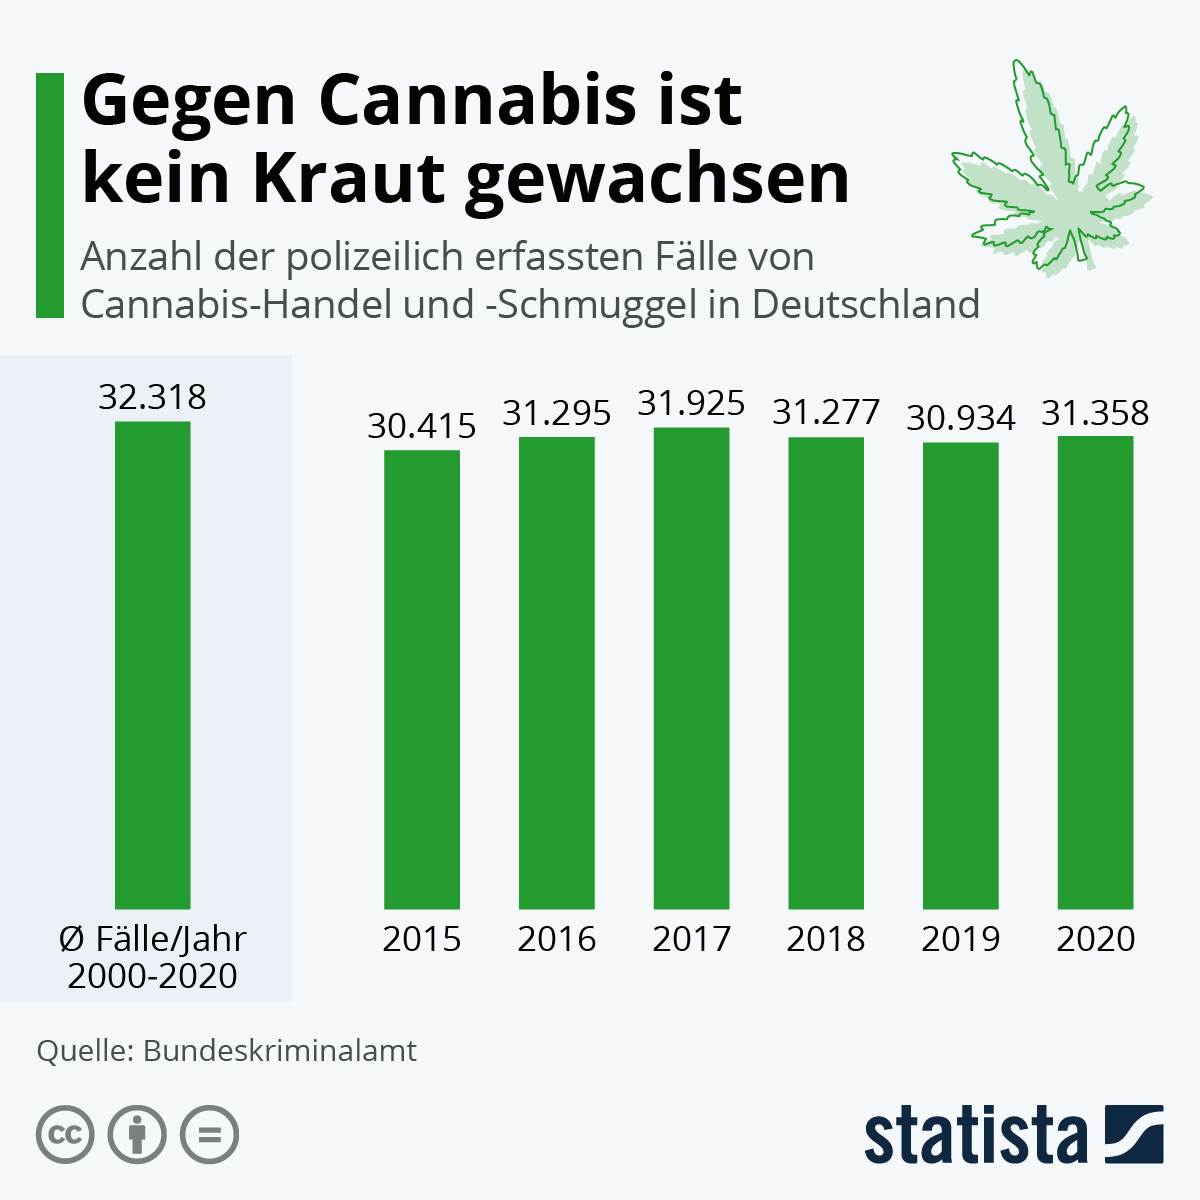 Infografik: Strafverfolgung stoppt Dealer nicht | Statista